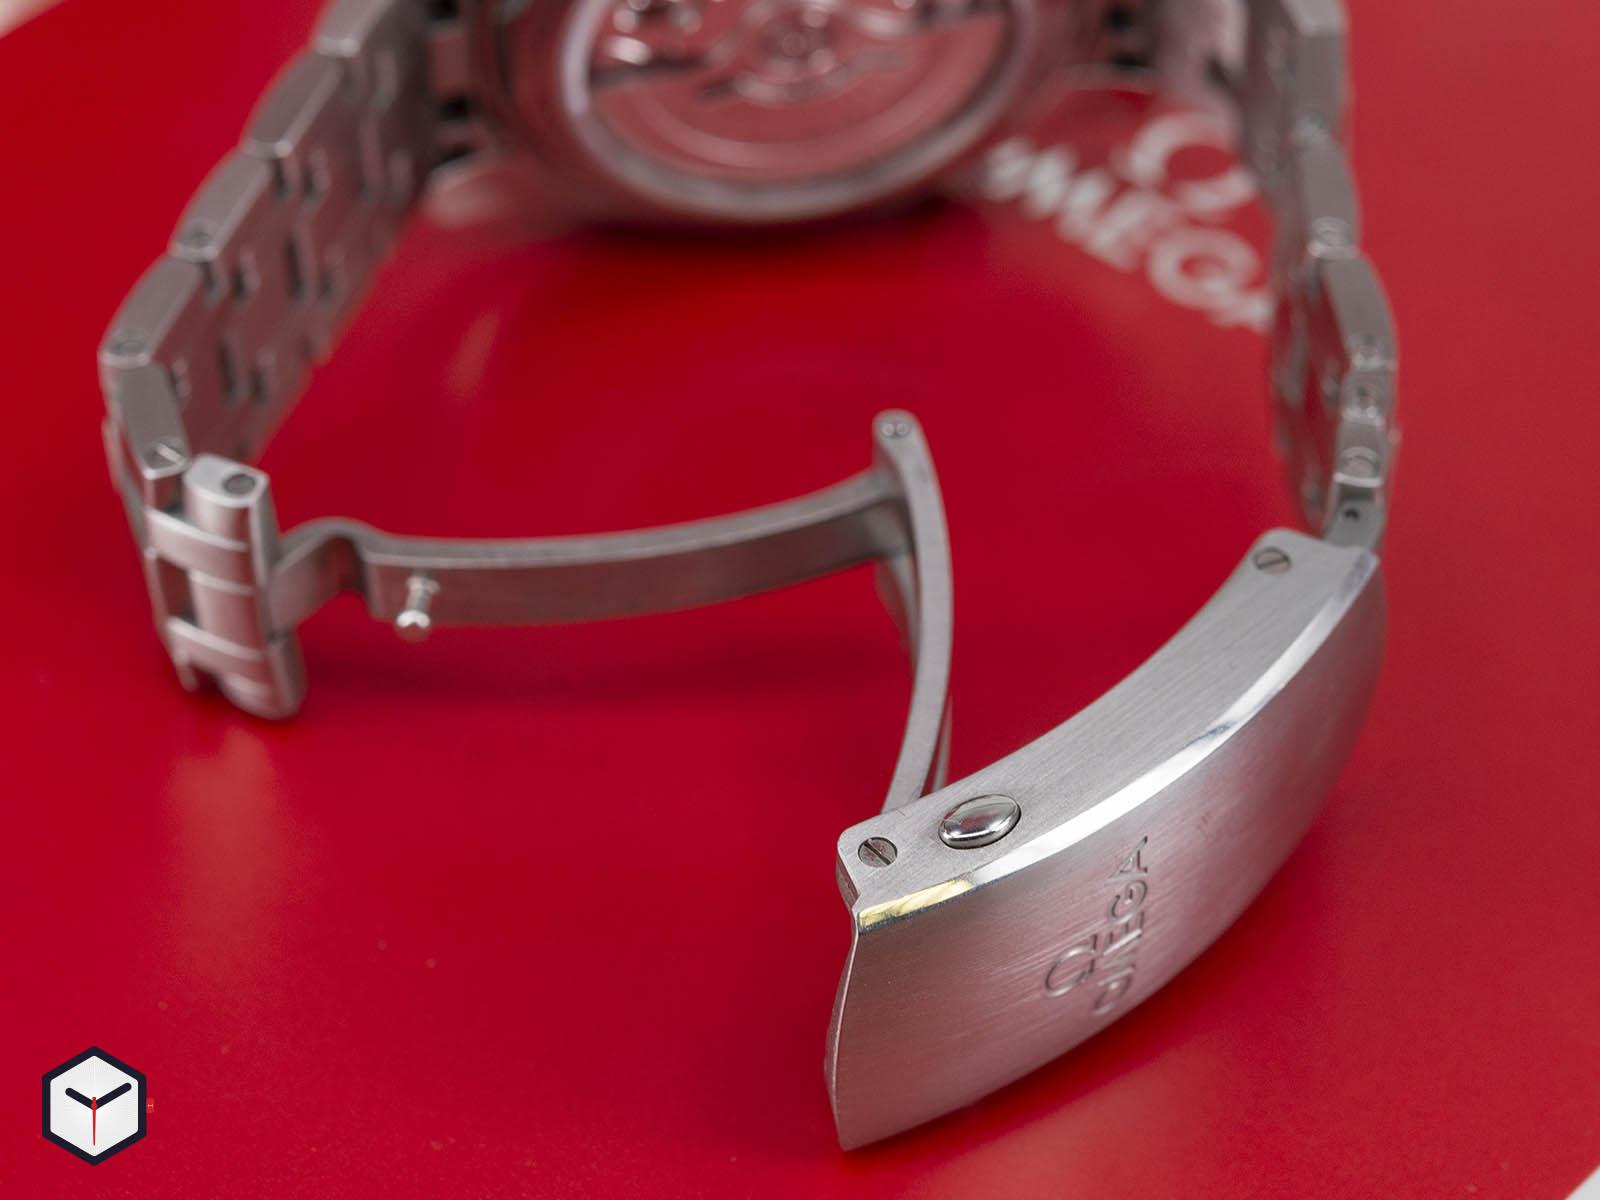 210-30-44-51-06-001-omega-diver-300m-co-axial-master-chronometer-chronograph-44-8.jpg